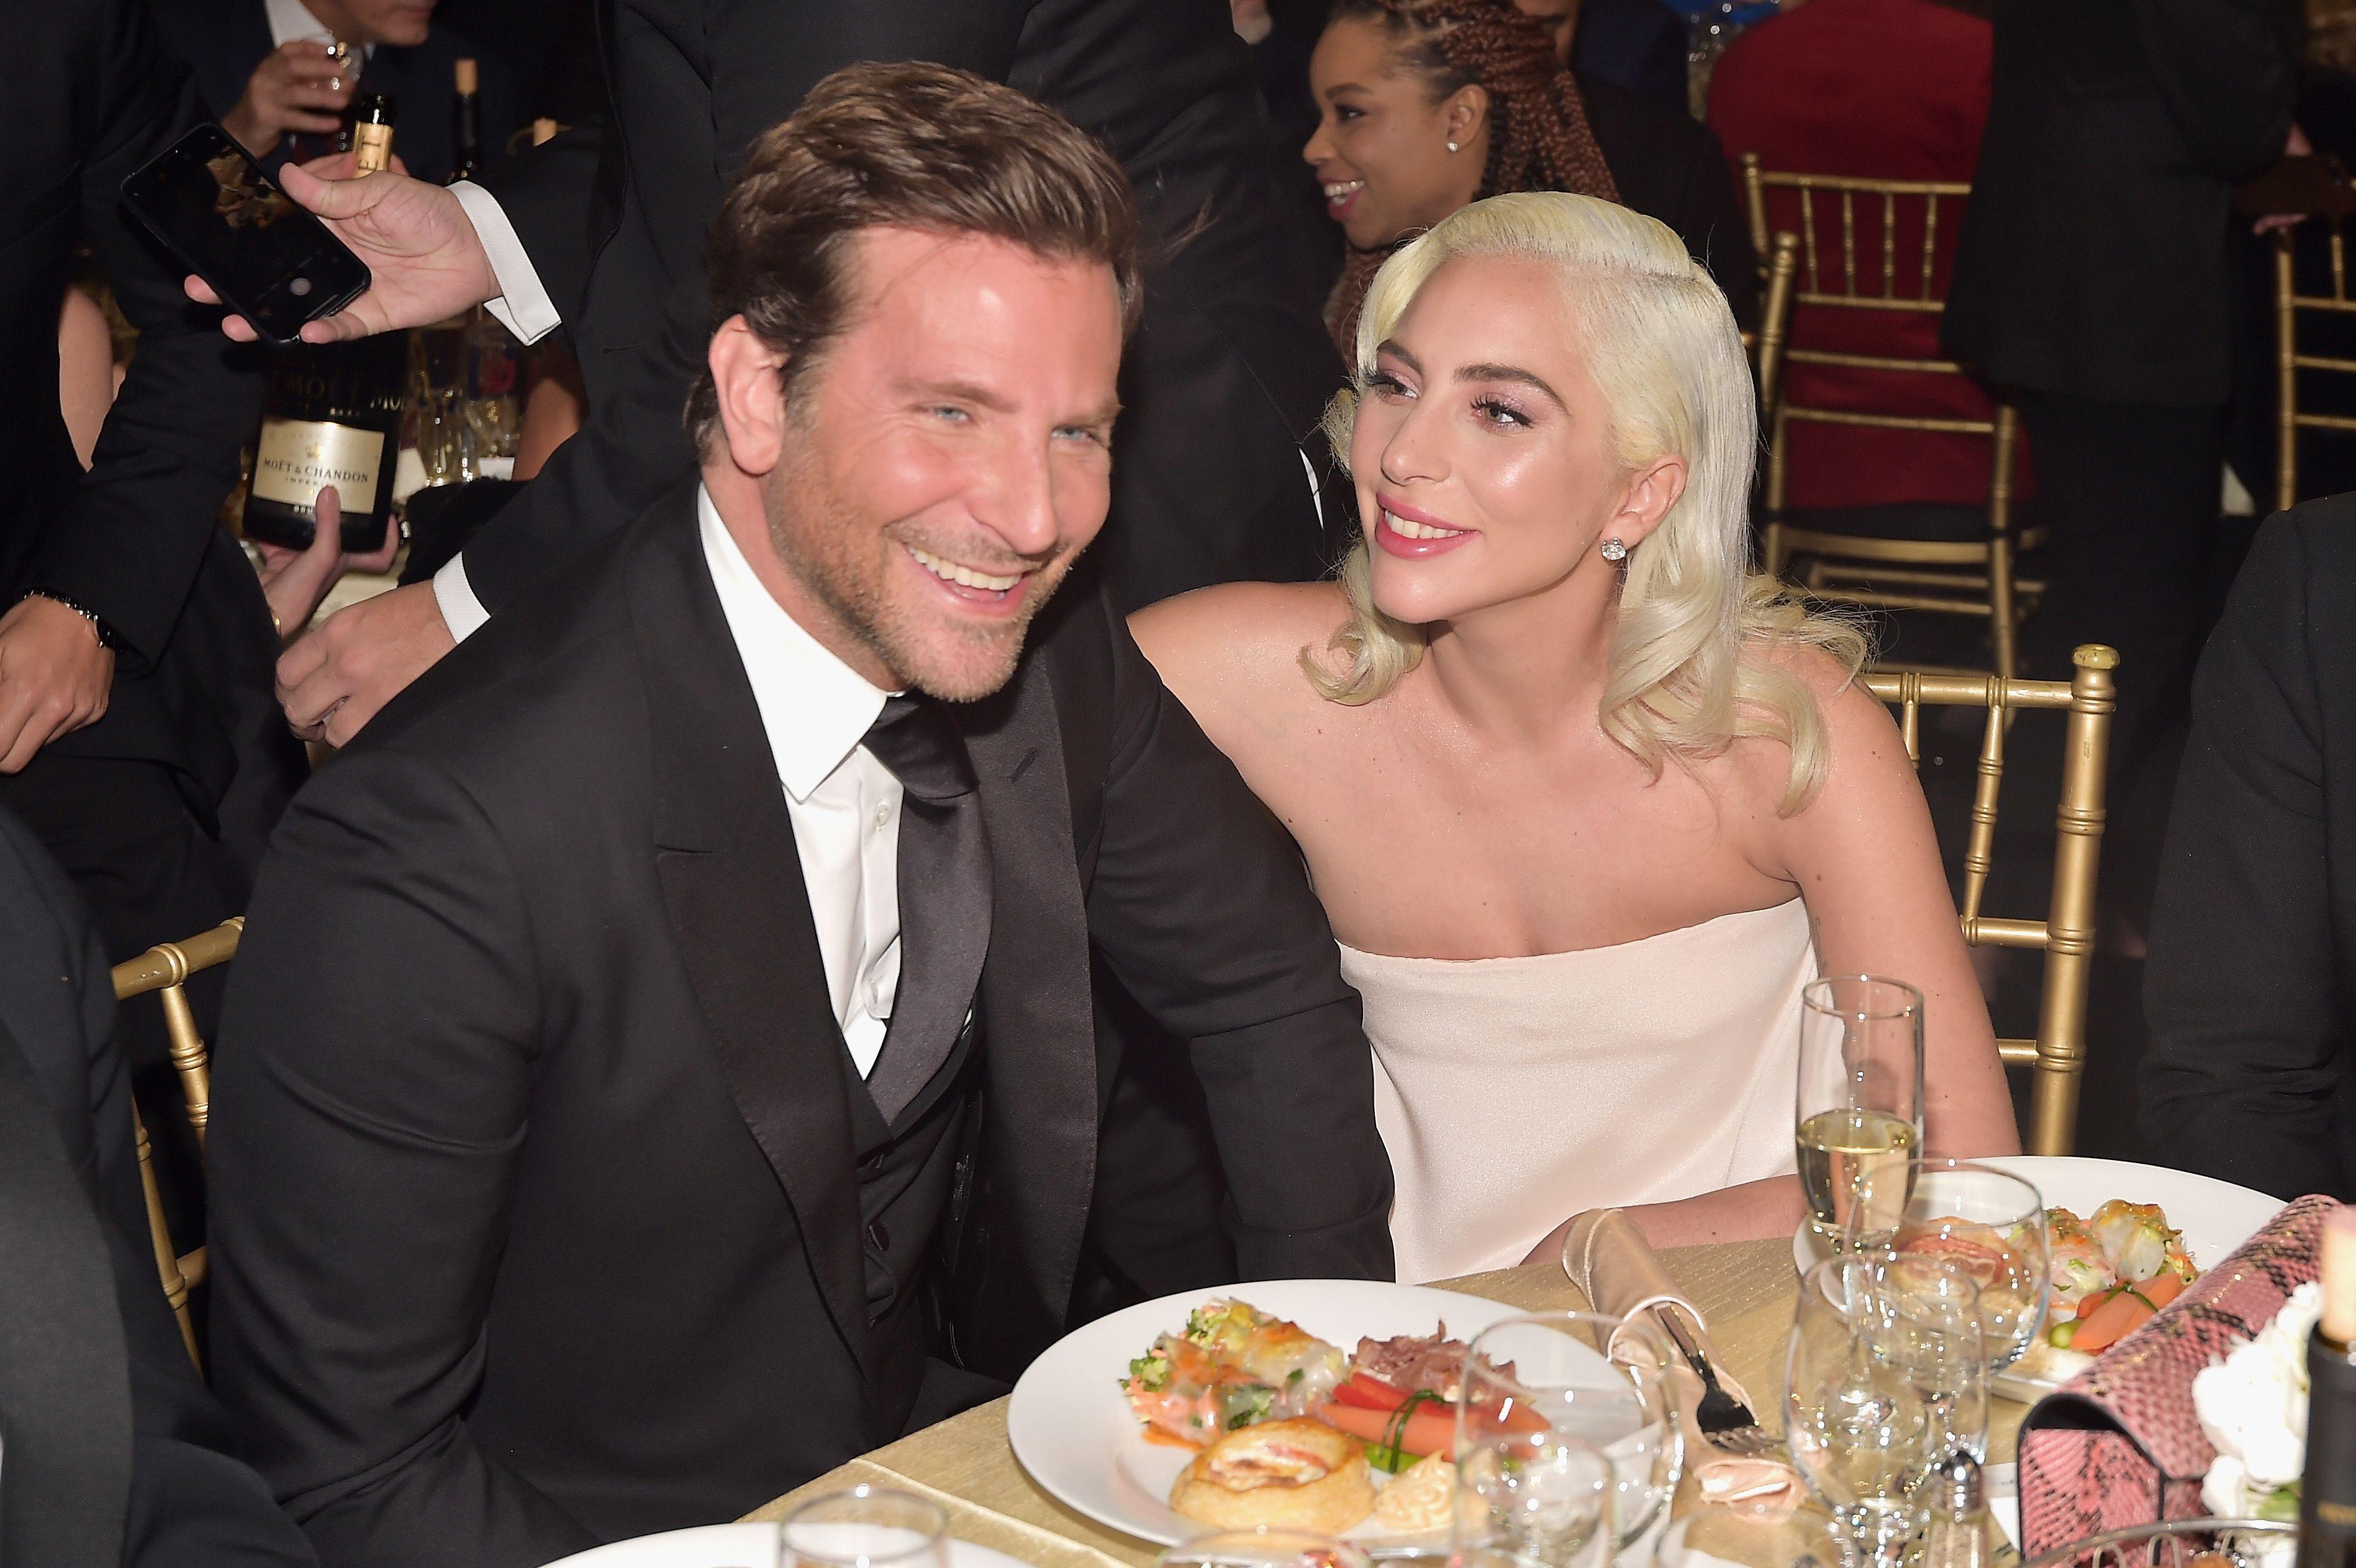 Did Bradley Cooper Cheat On Irina Shayk With Lady Gaga